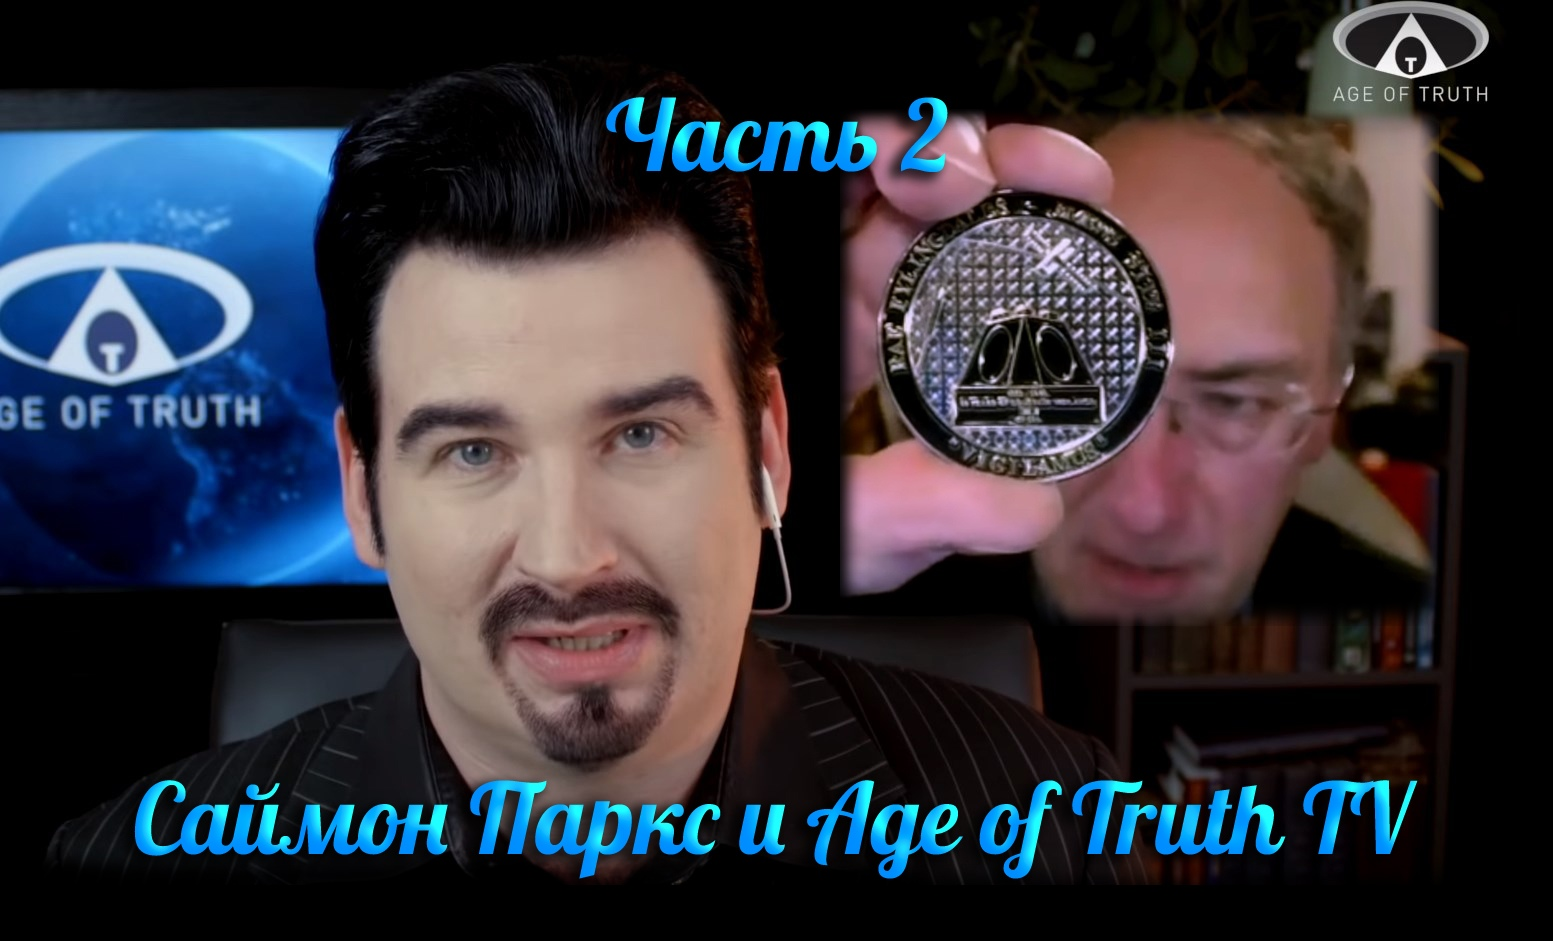 Интервью Саймона Паркса для Age of Truth TV с Лукасом Александром (15 апреля 2019 г.) QBmgTA0O_yk